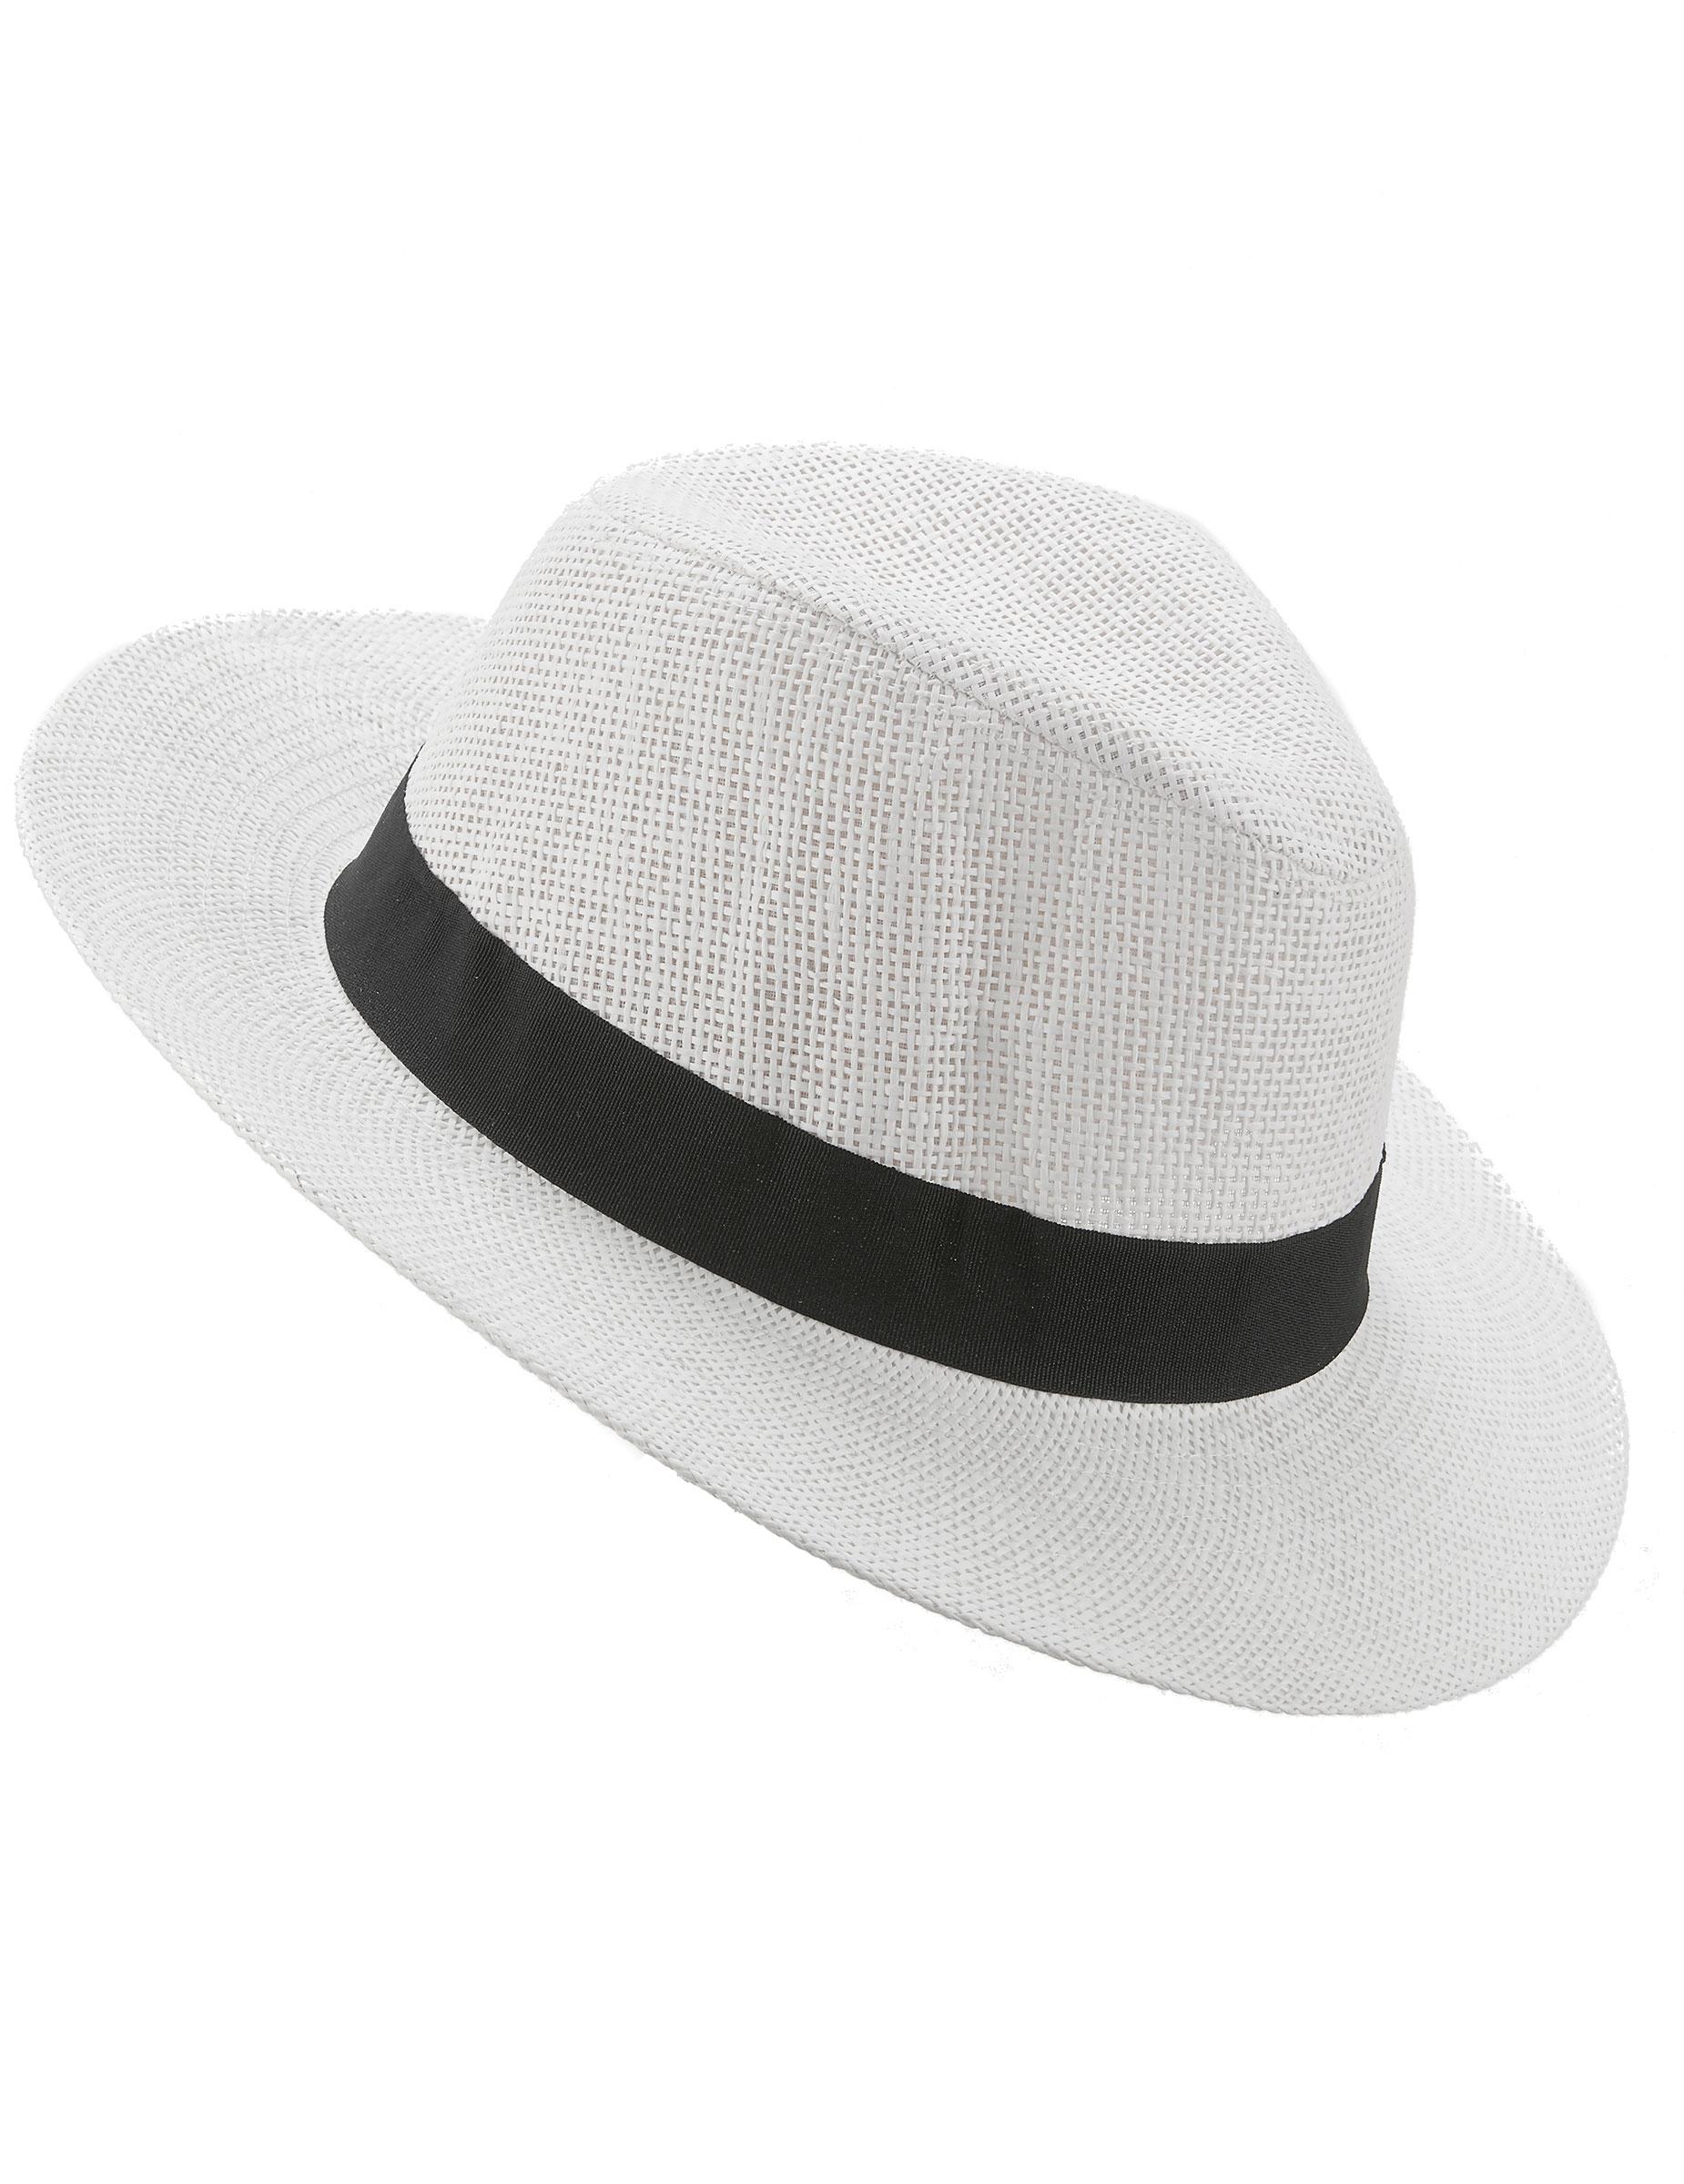 77a58a9eb1e22 Chapéu Panamá branco com fita preta - adulto  Chapéus